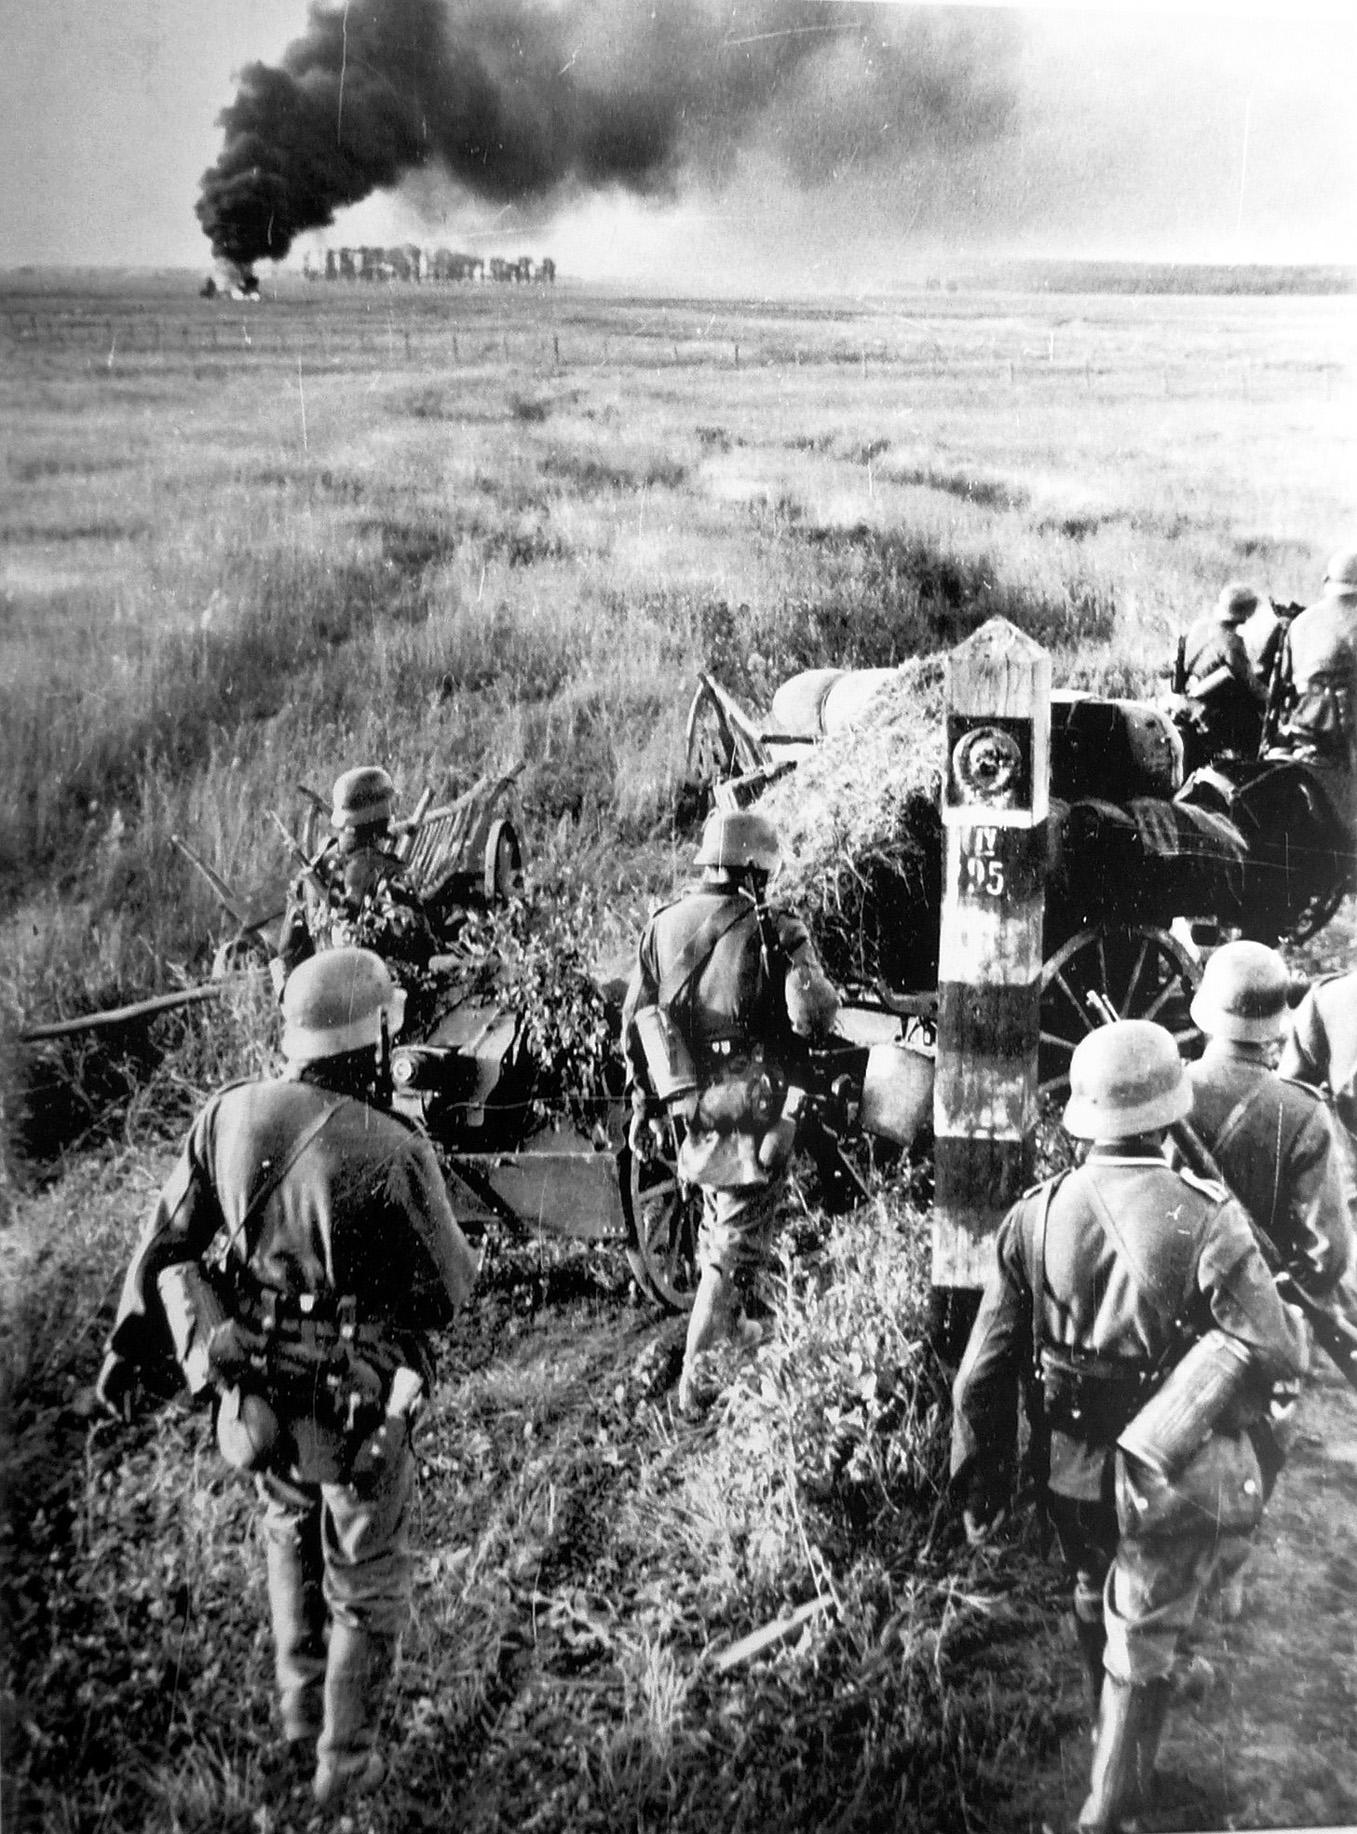 German troops crossing the Soviet border Image public domain